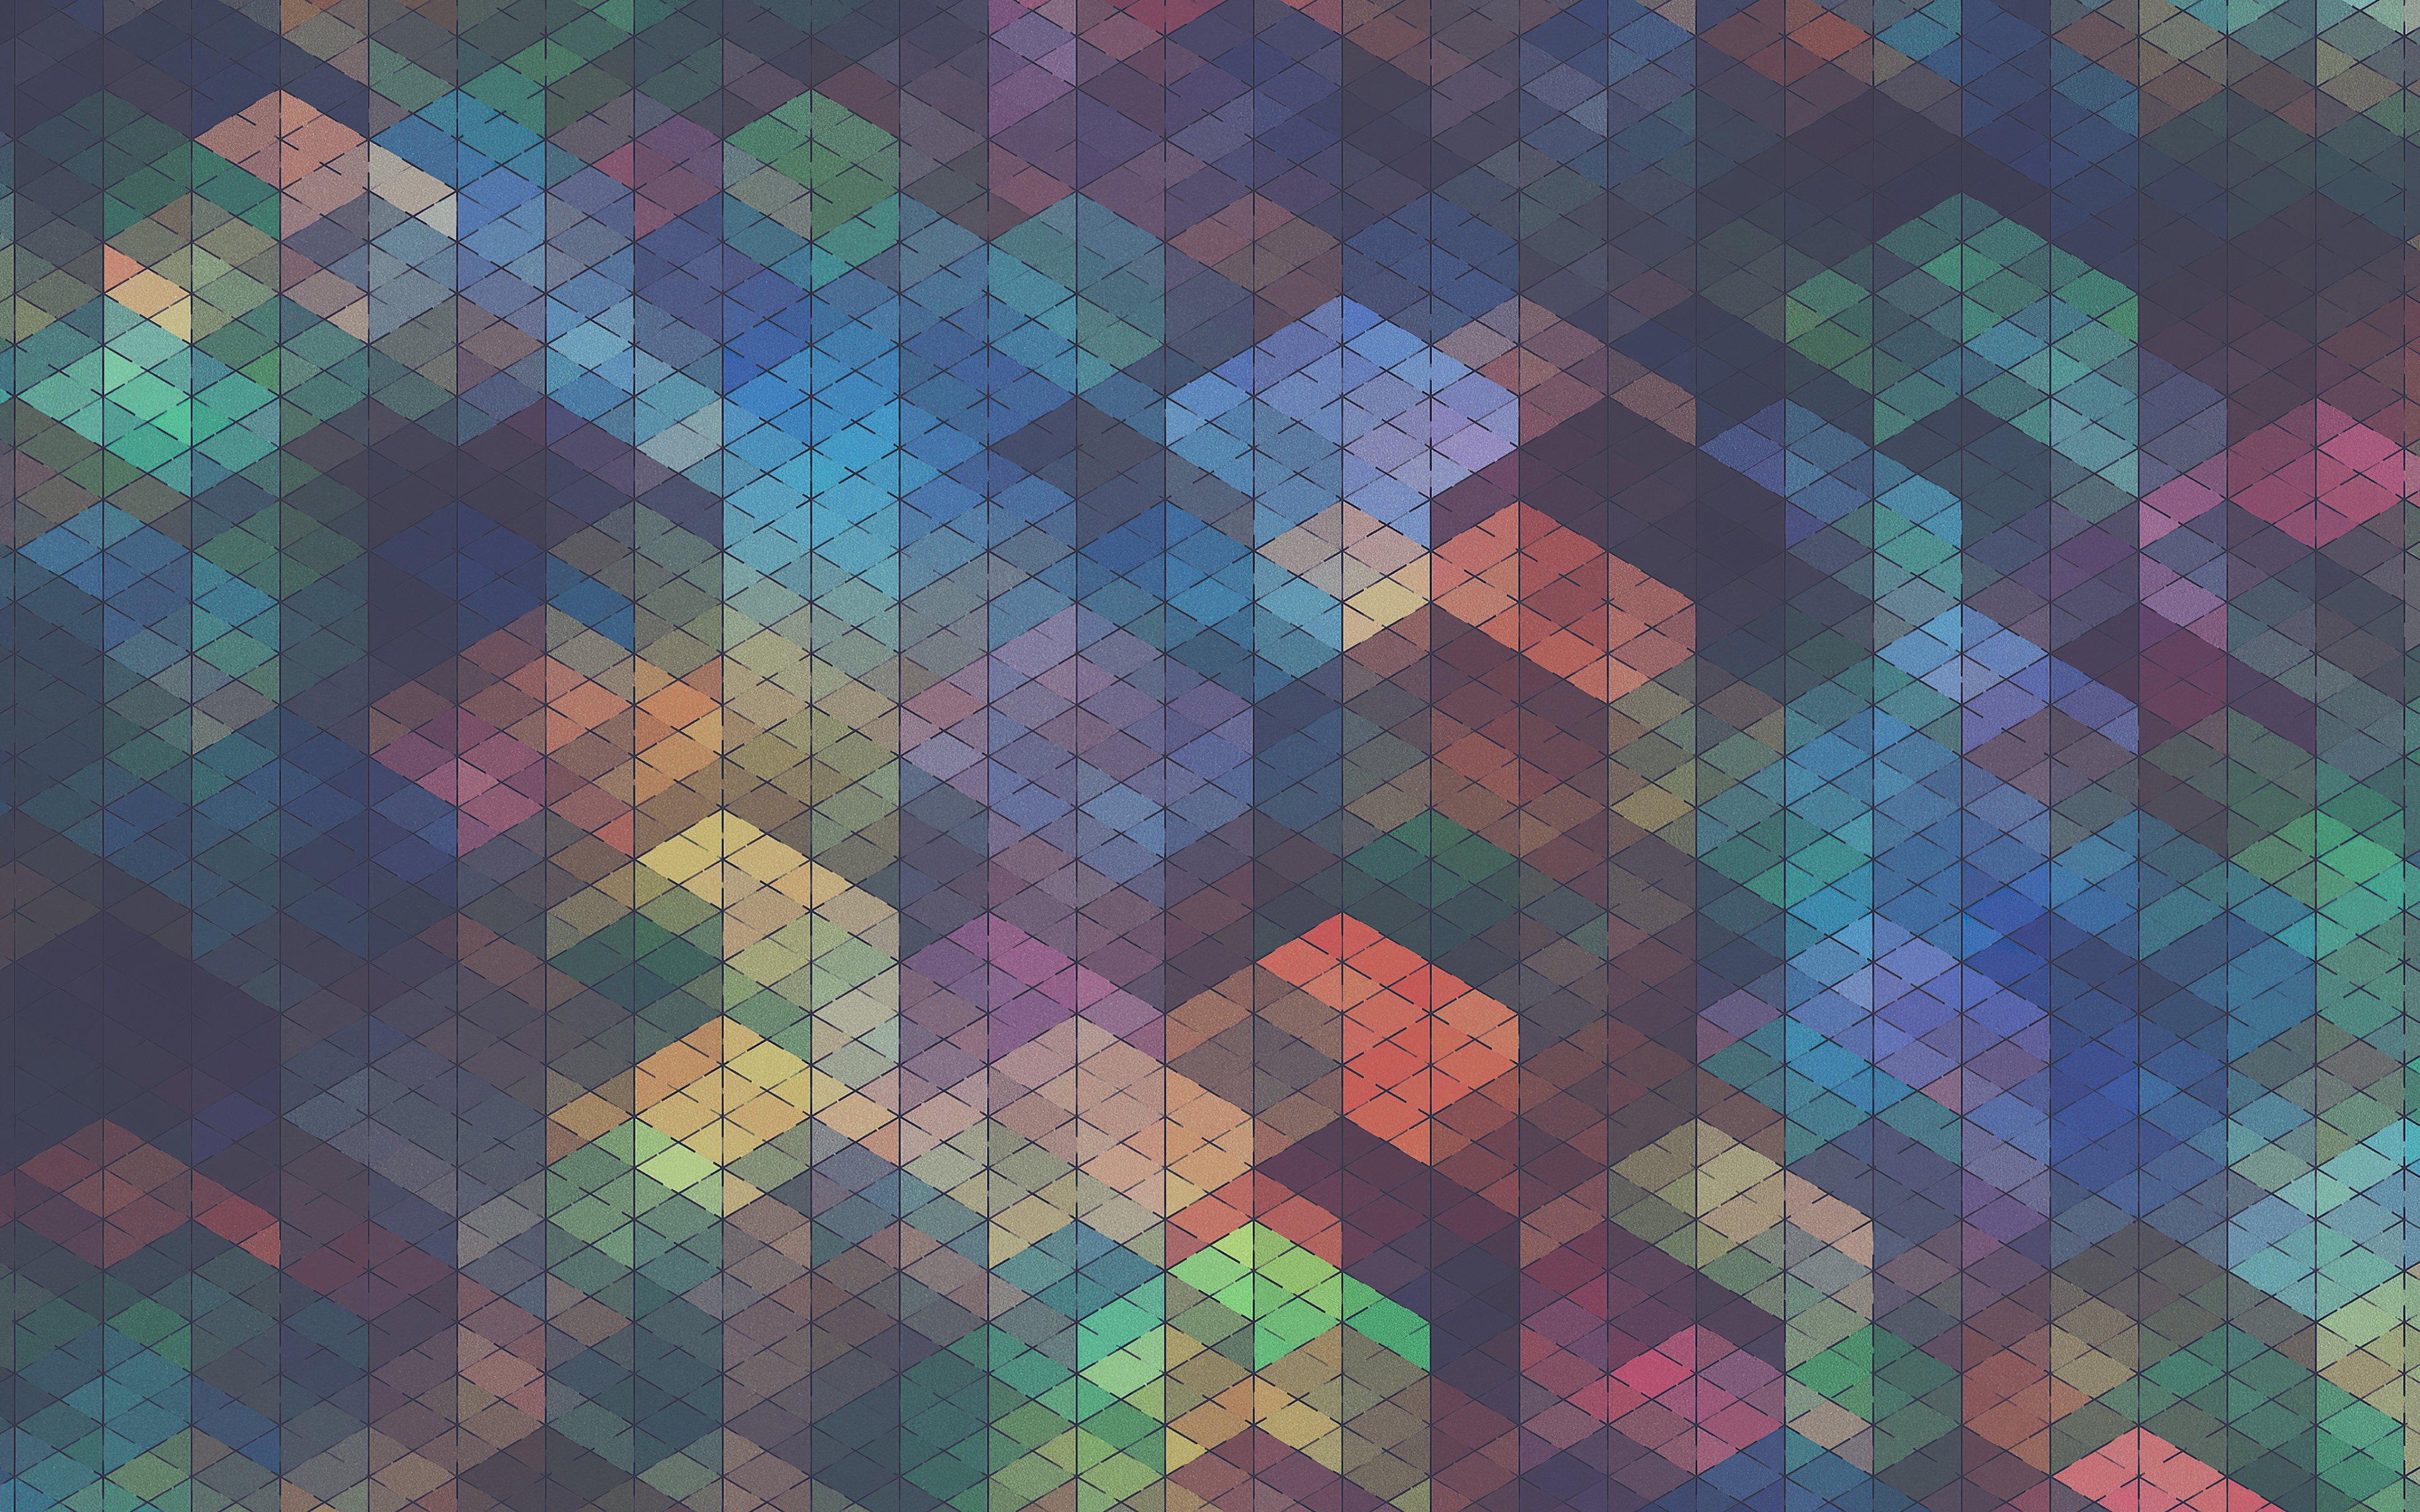 Fondos de pantalla Figuras geometricas de colores abstractas